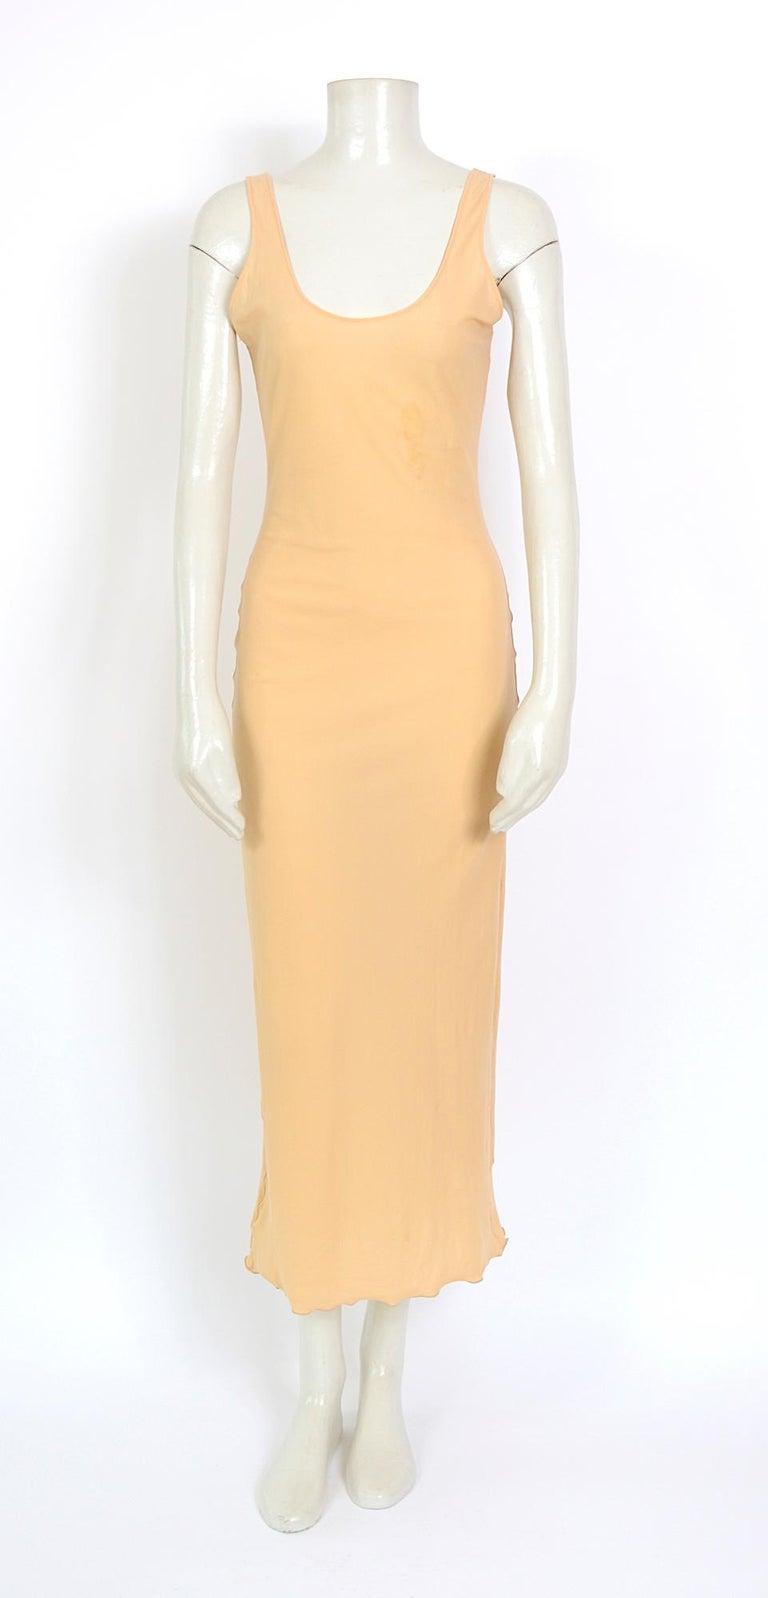 Jean Paul Gaultier classique vintage 1990s cuba print + nude mesh slip dresses  For Sale 4